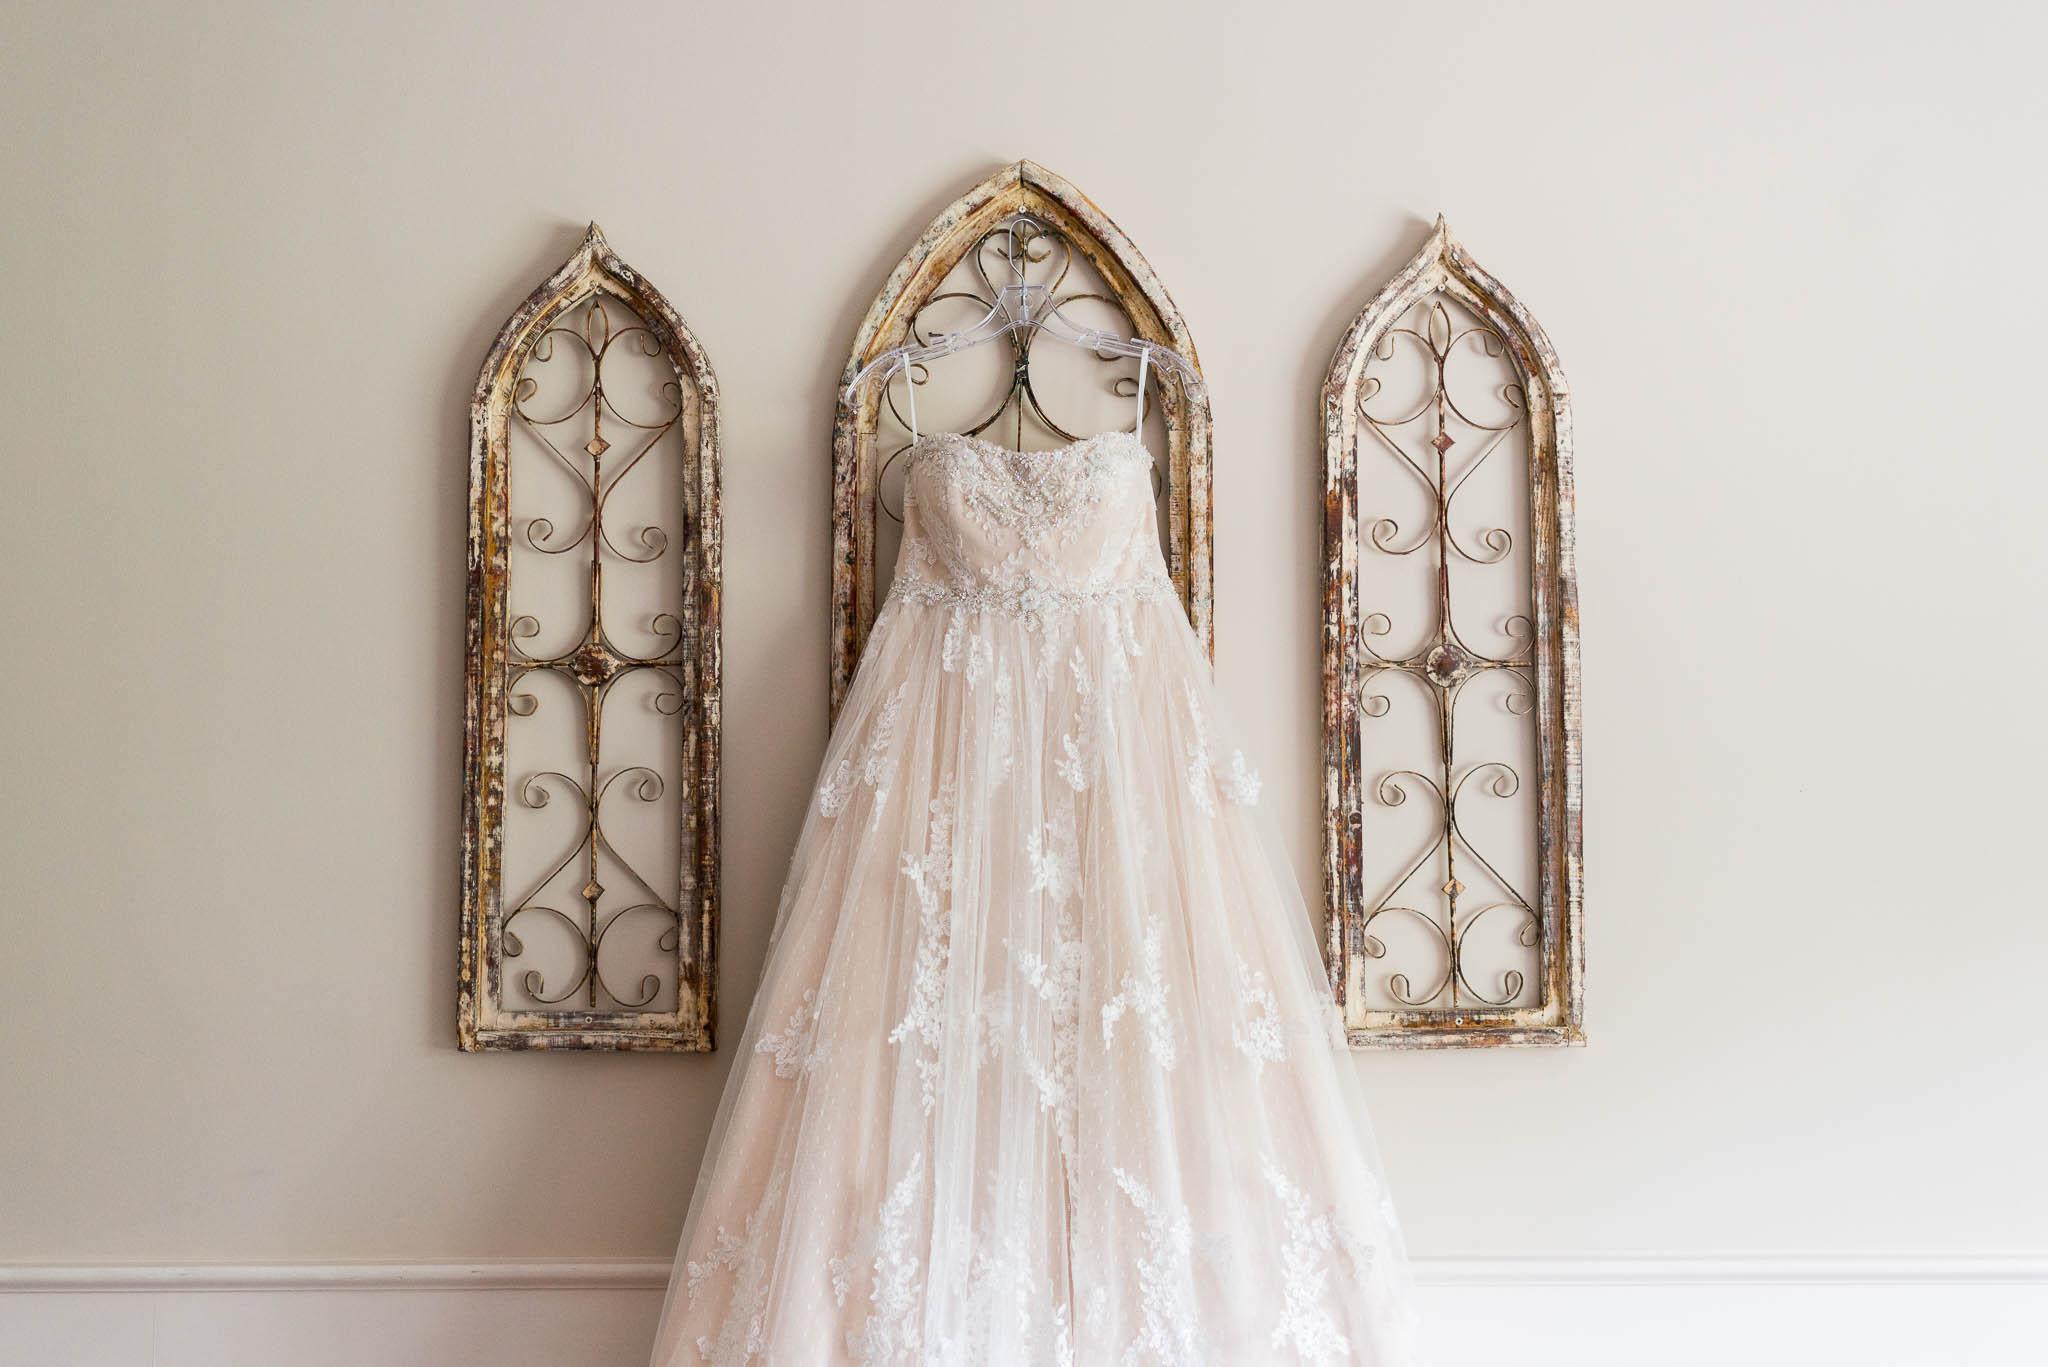 Kirsten-Smith-Photography-Courtney-Kevin-Wedding-16.jpg